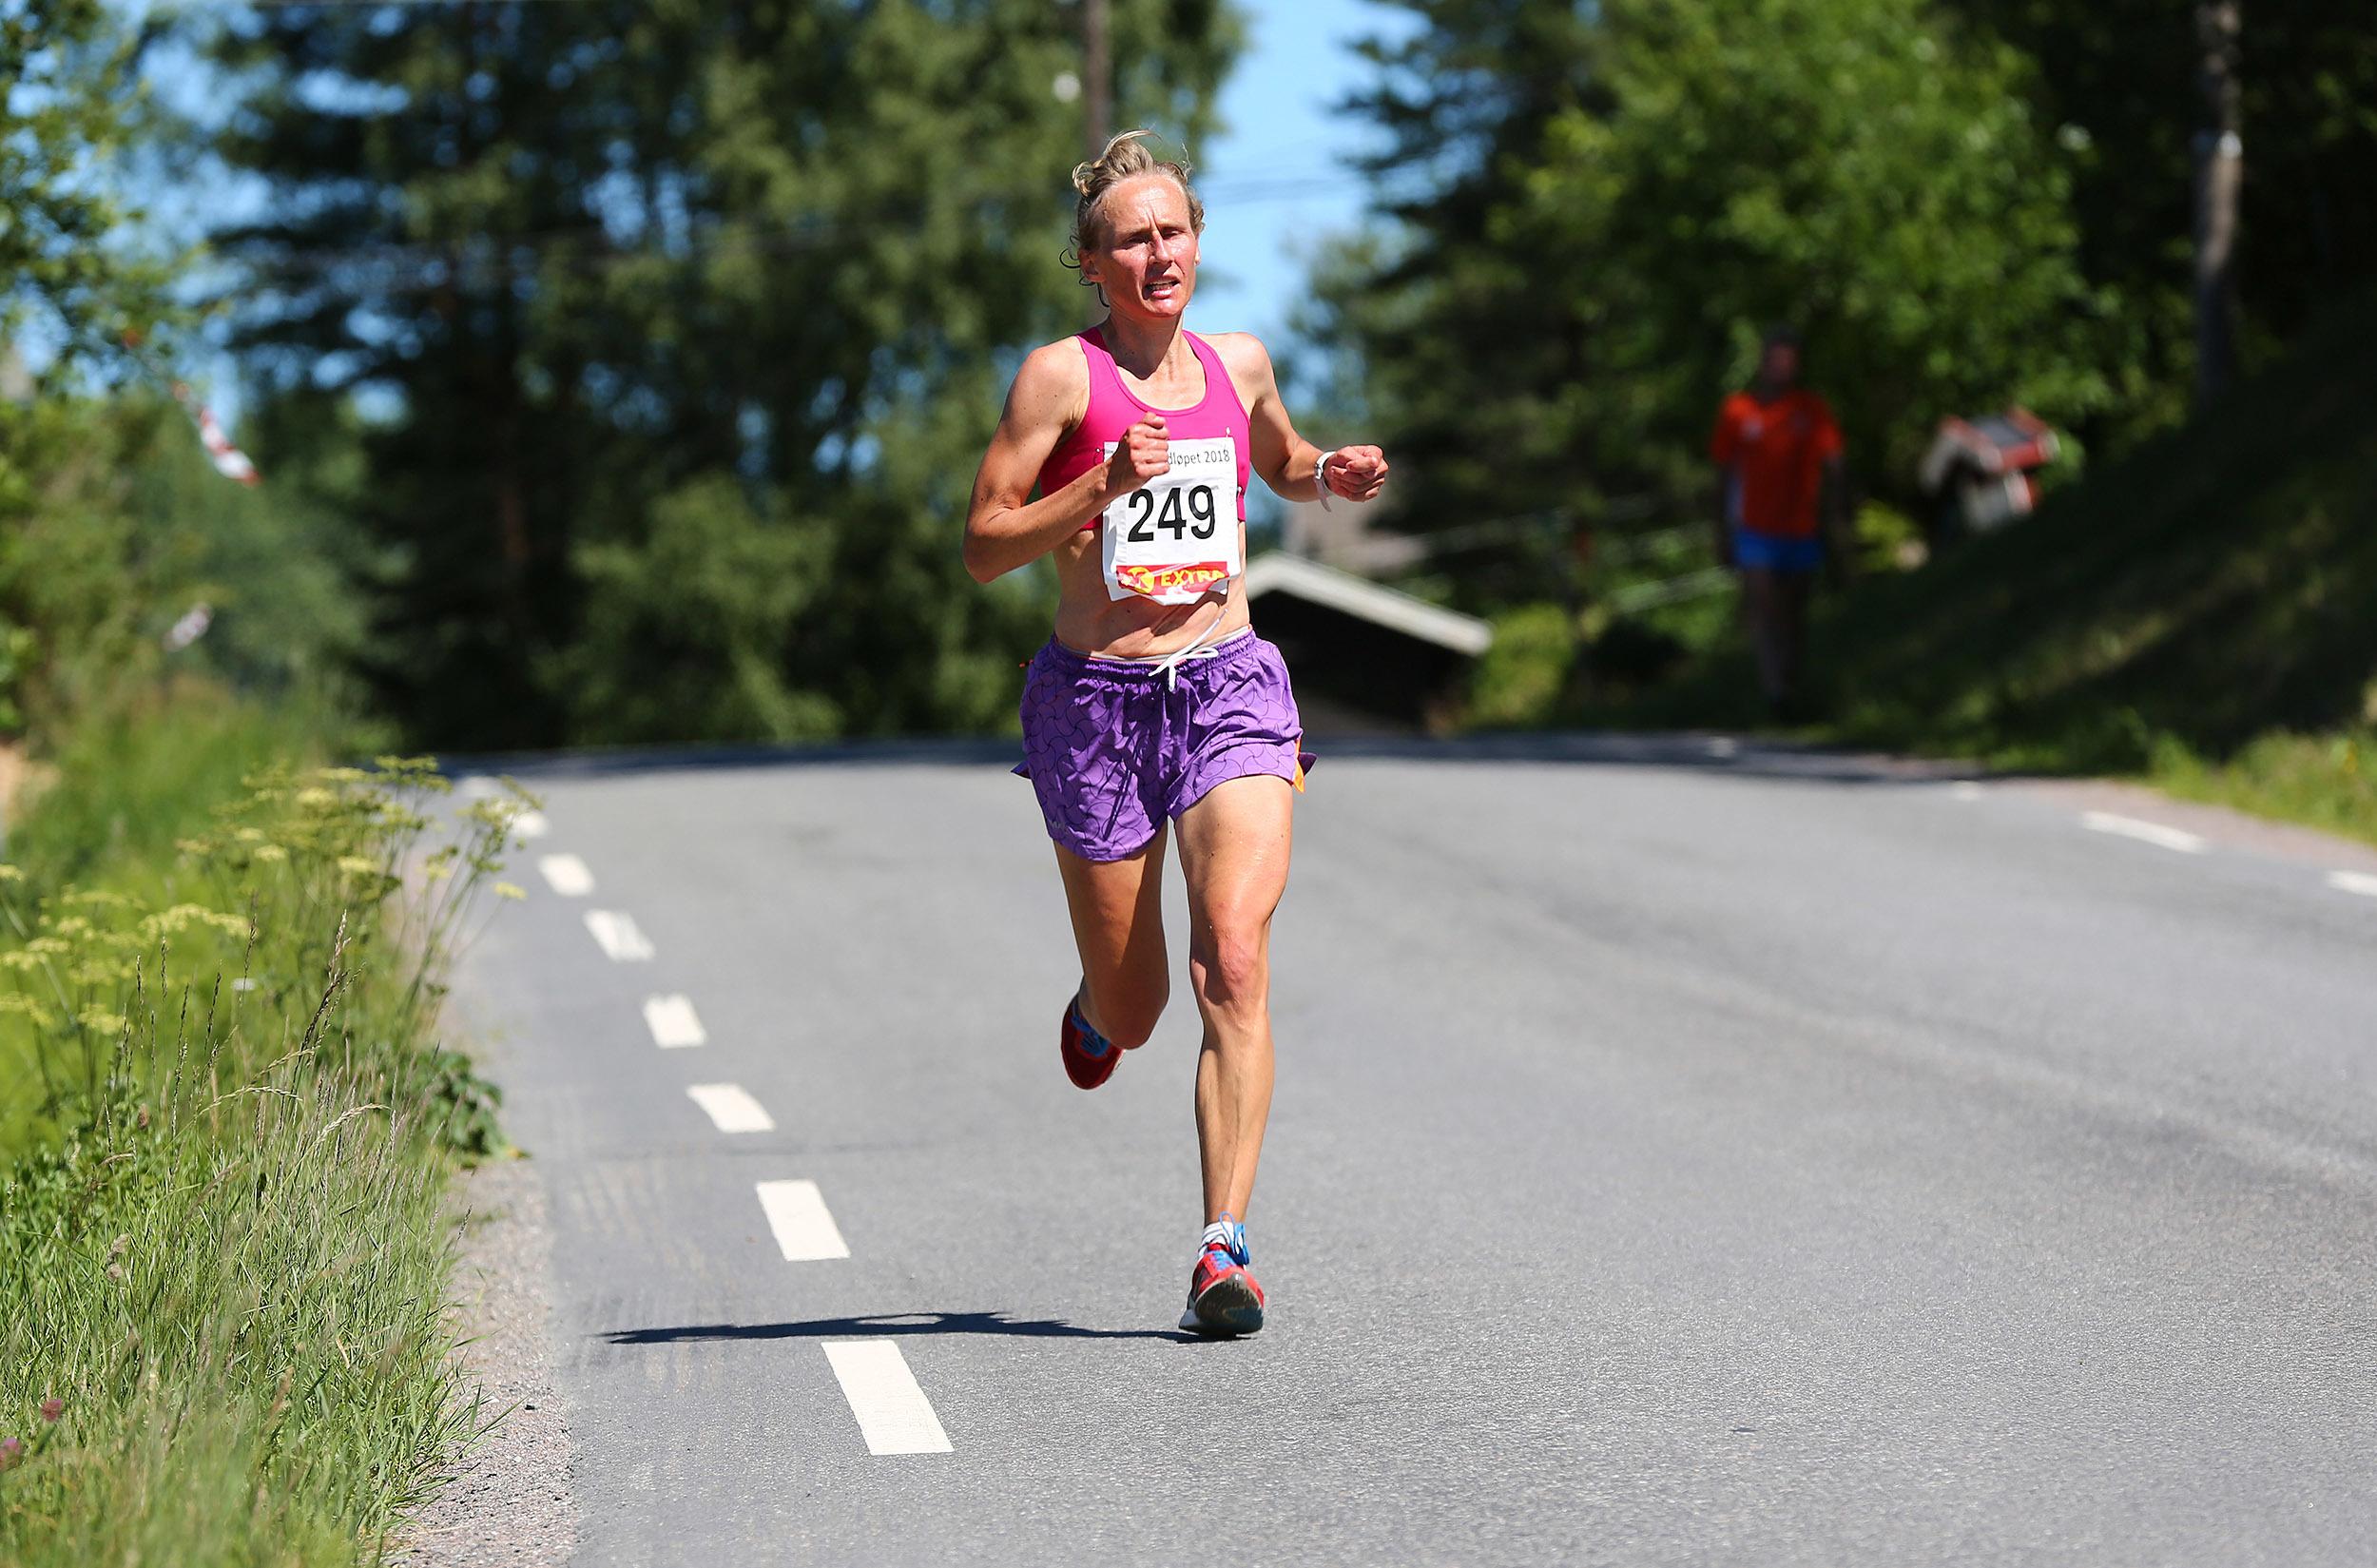 Stomperudløpet2018-17km-Siri Størmer.jpg